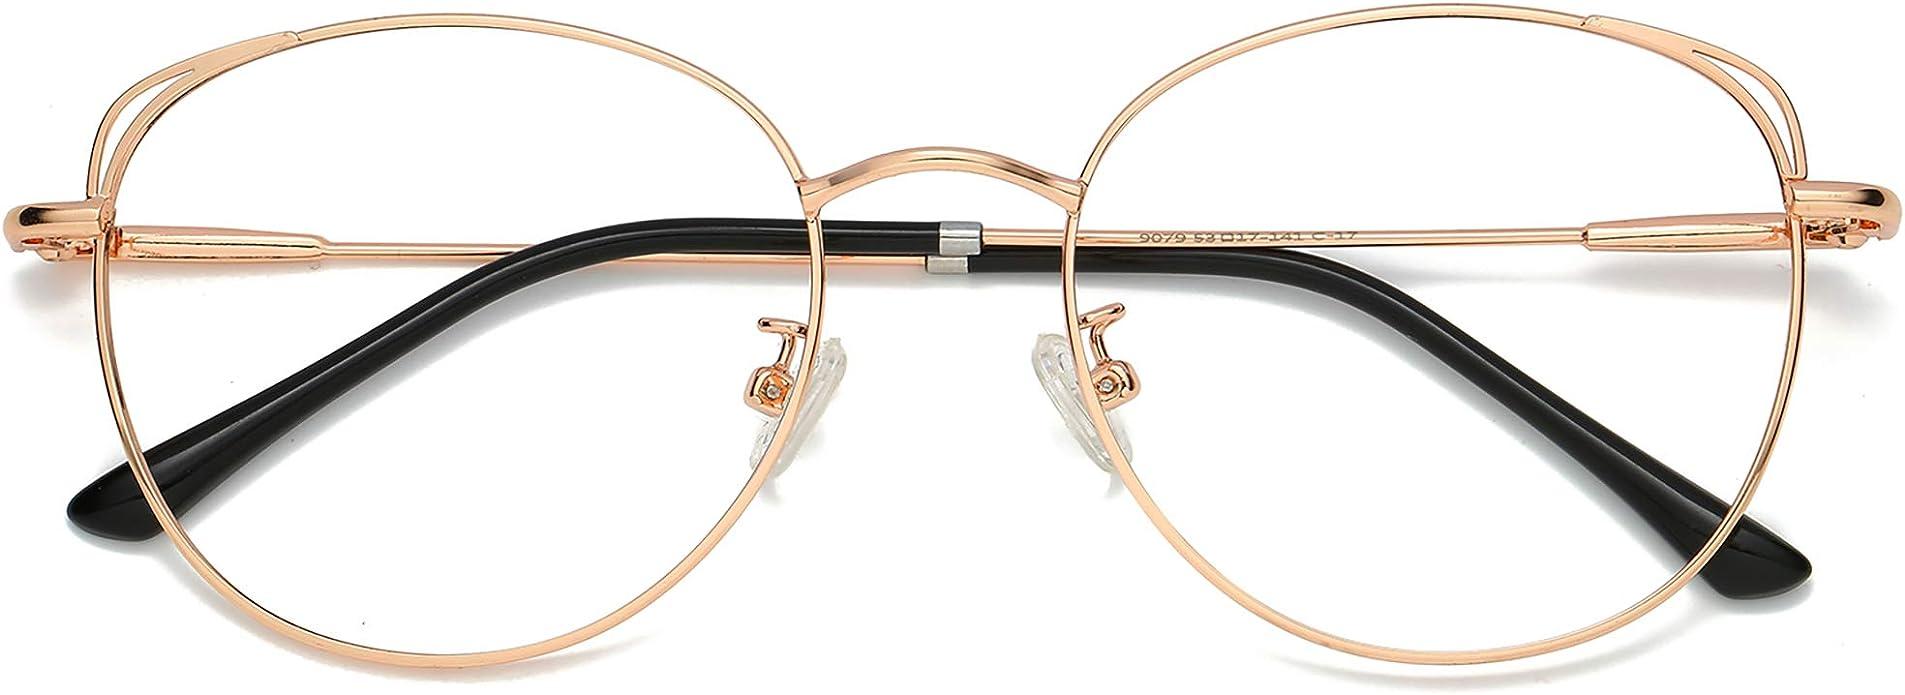 SOJOS Cat Eye Blue Light Blocking Glasses Hipster Metal Frame Women Eyeglasses She Young